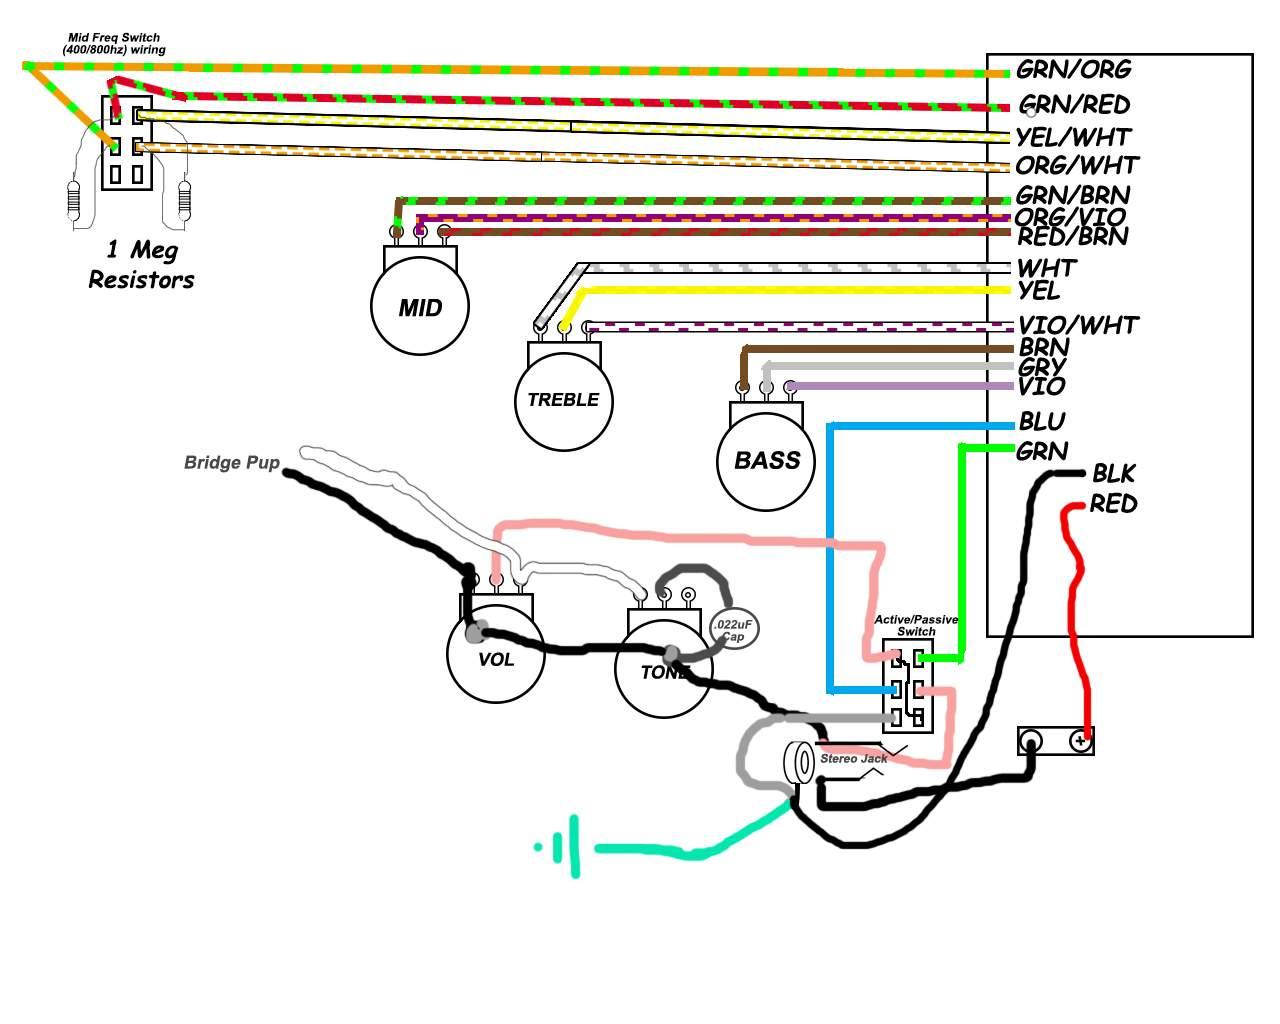 norma guitar wiring diagram free download wiring diagram xwiaw rh xwiaw us Guitar Pickup Wiring Diagrams Guitar Wiring Diagrams 2 Pickups